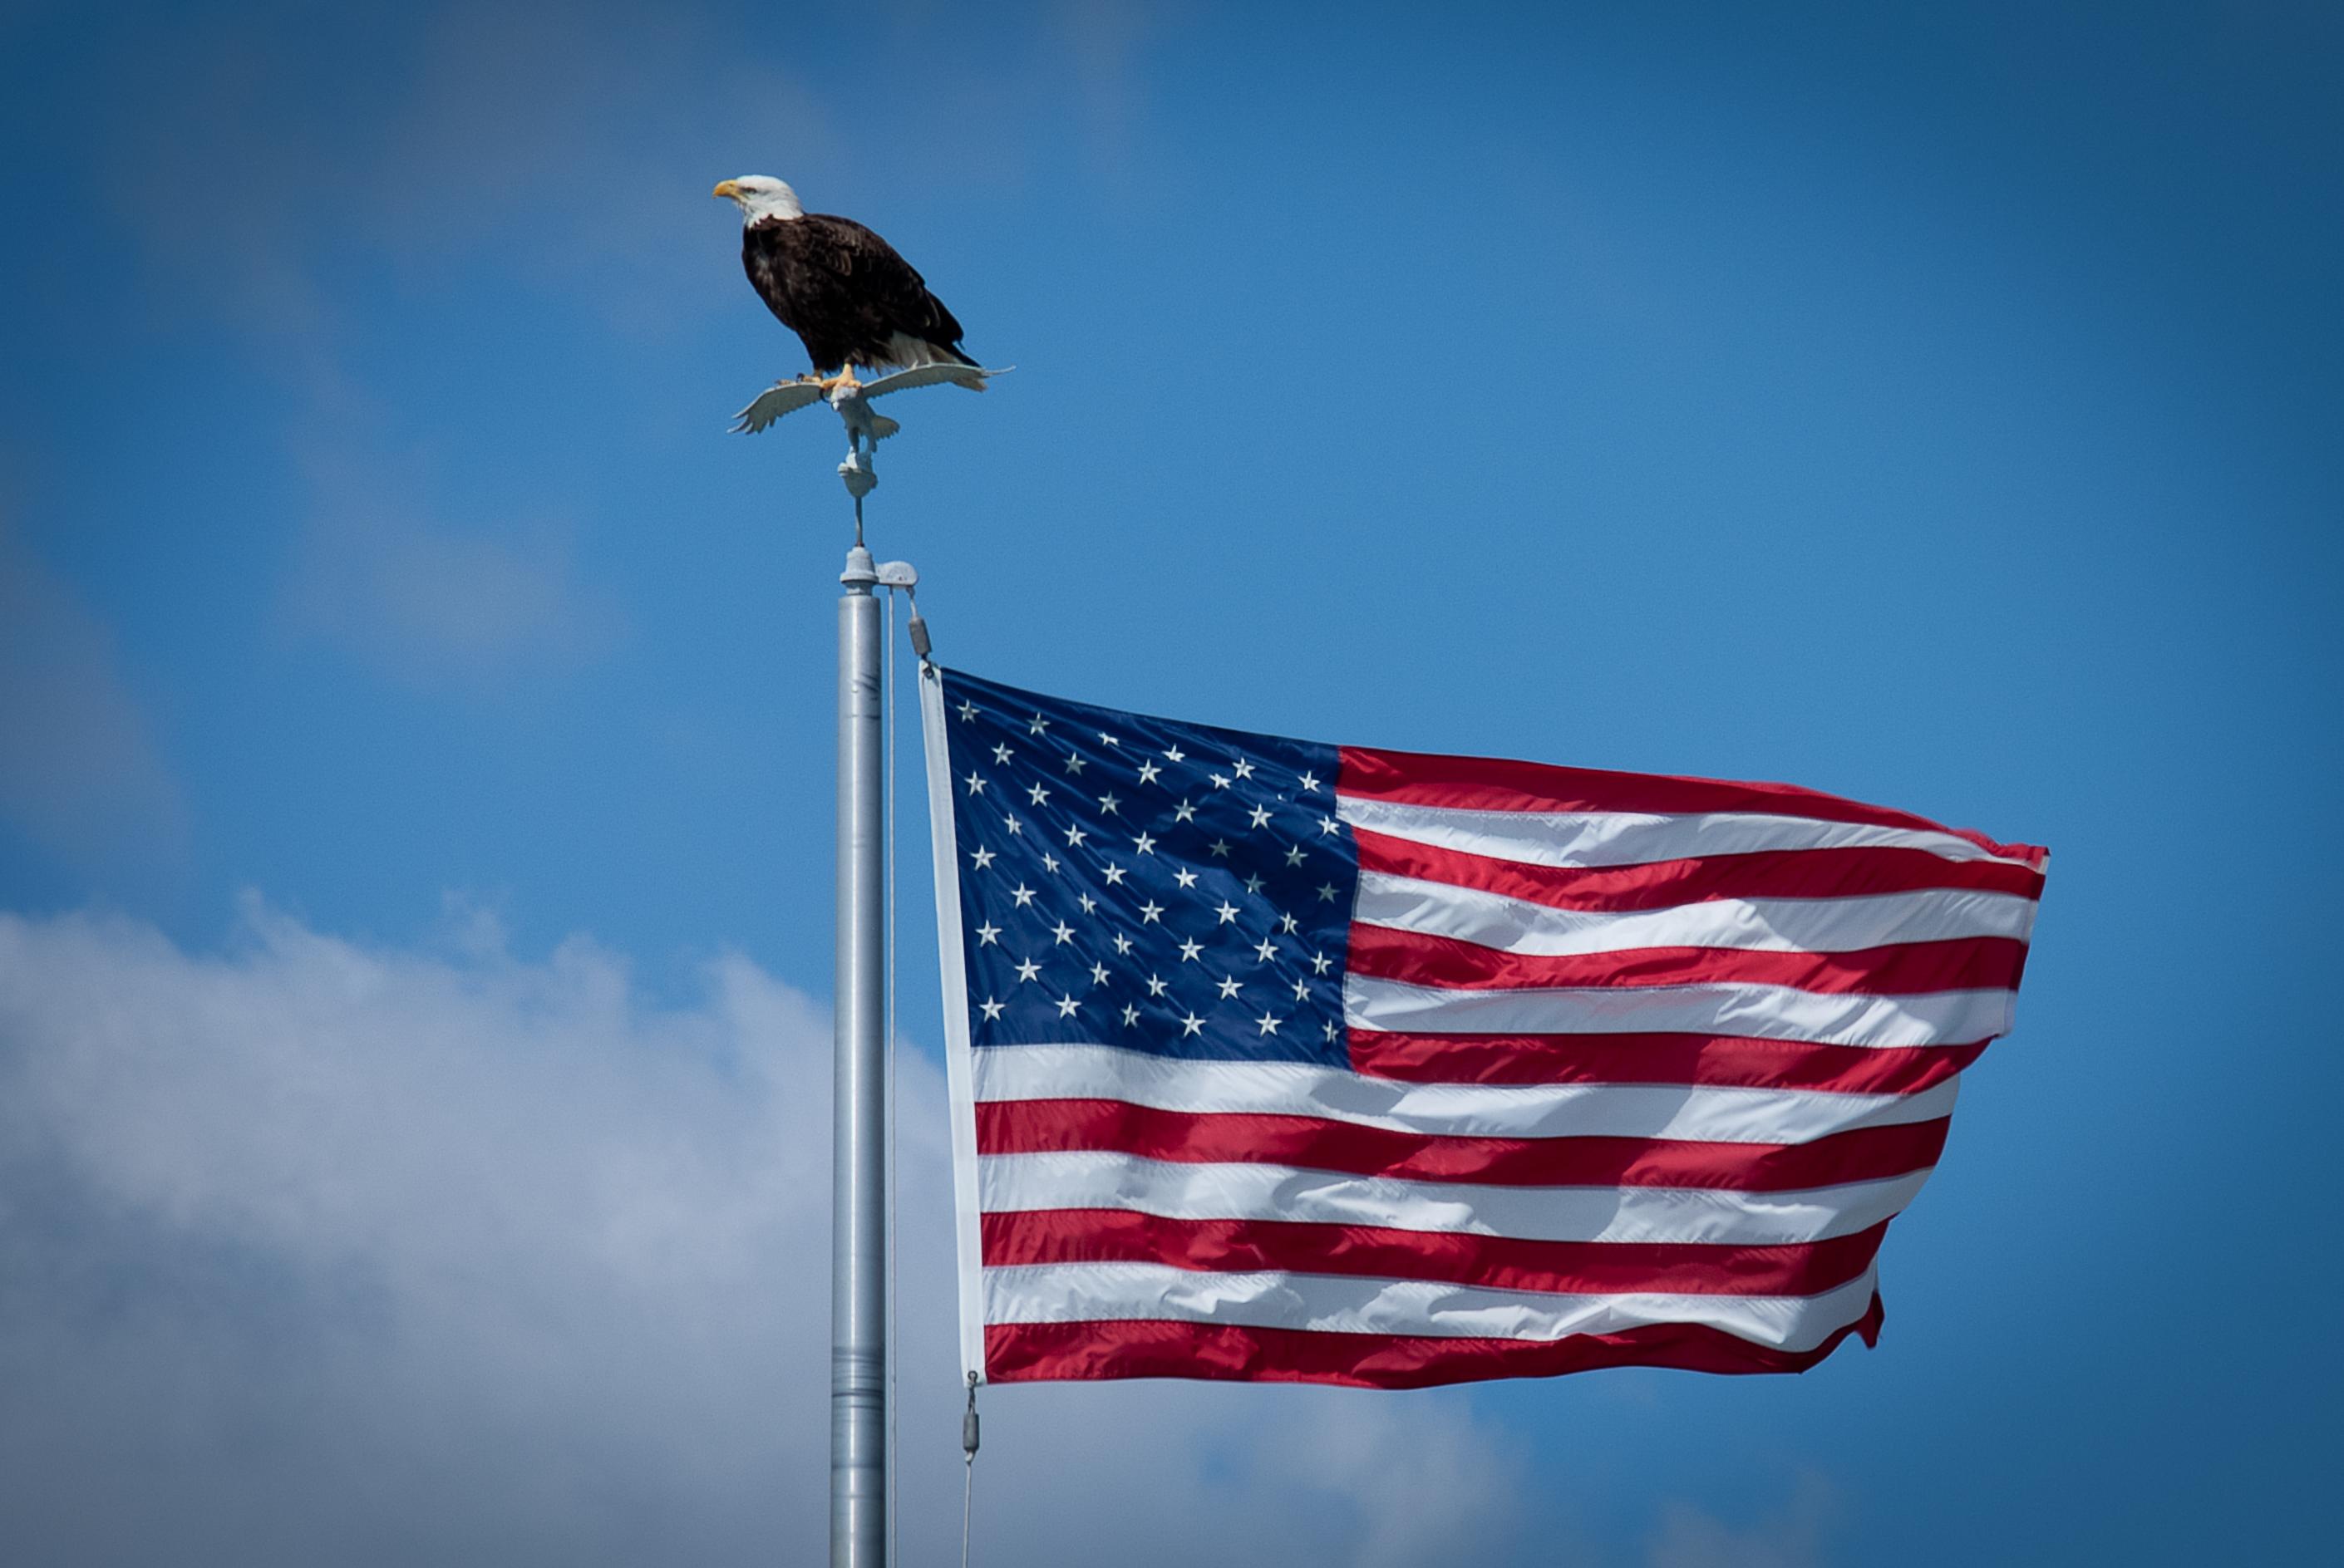 #flagday, #baldeagle, #florida, #naples, #americanflag, #bluesky